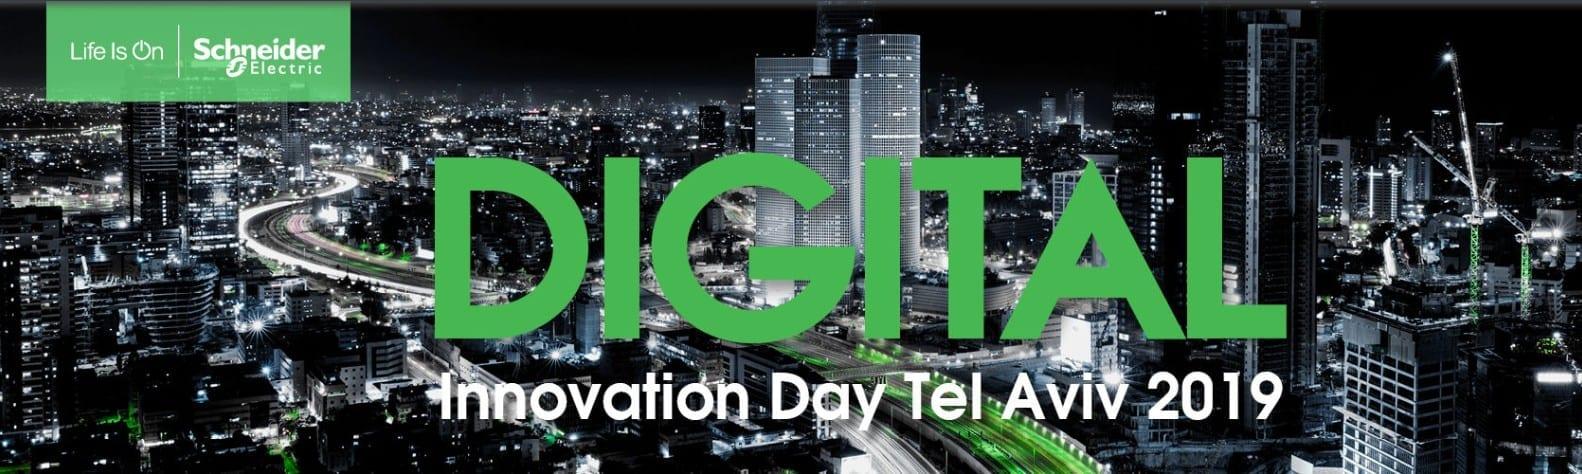 Digital innovation day schneider electric